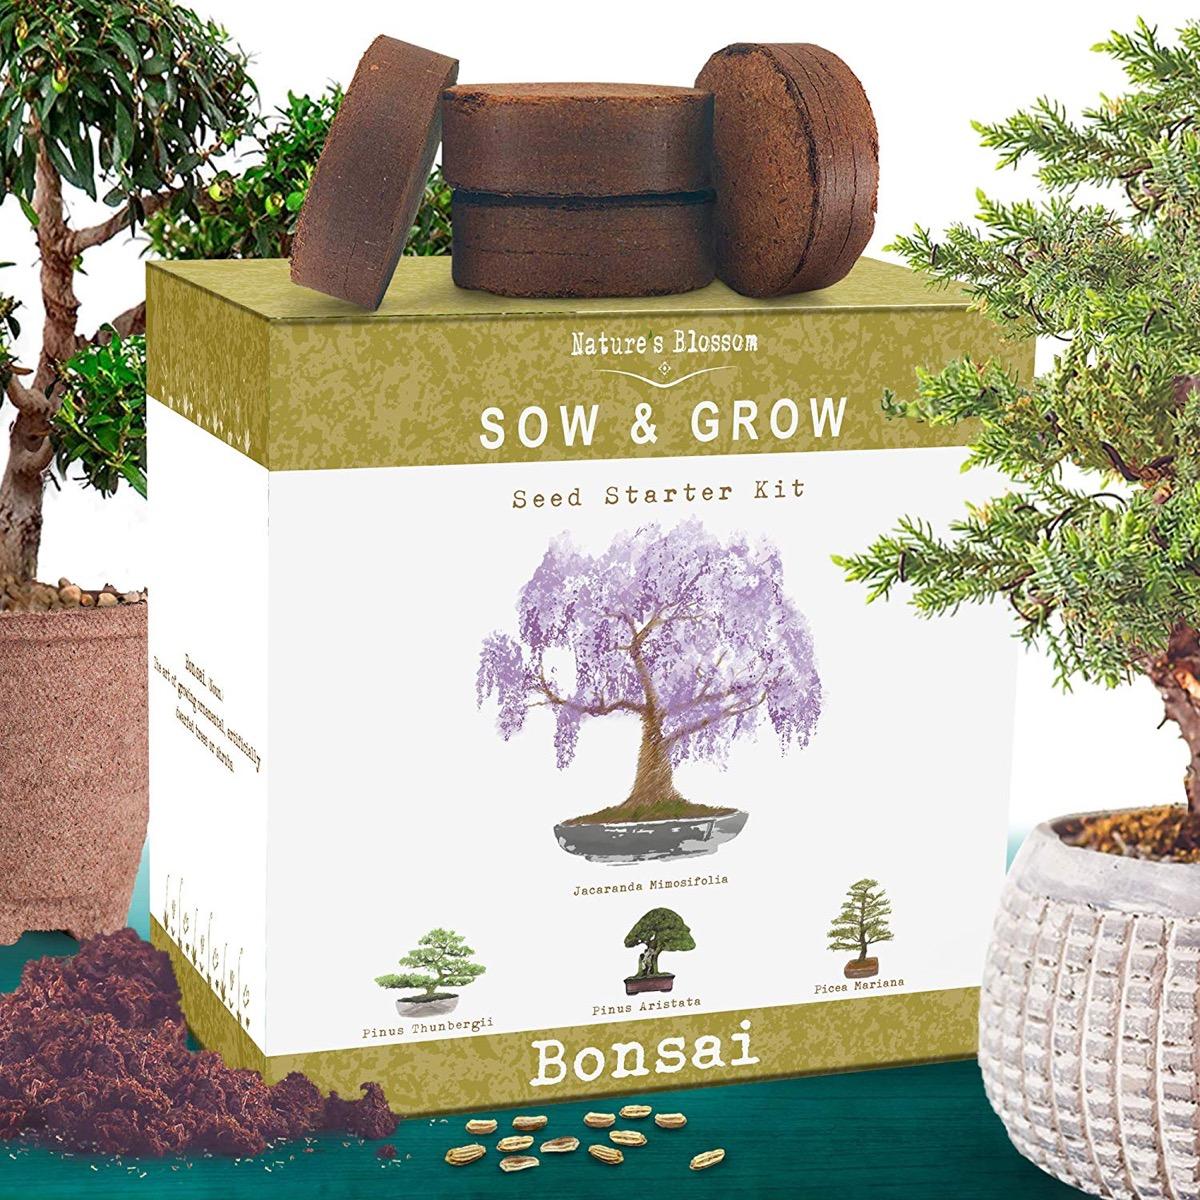 bonsai tree starter kit box with planting discs on top